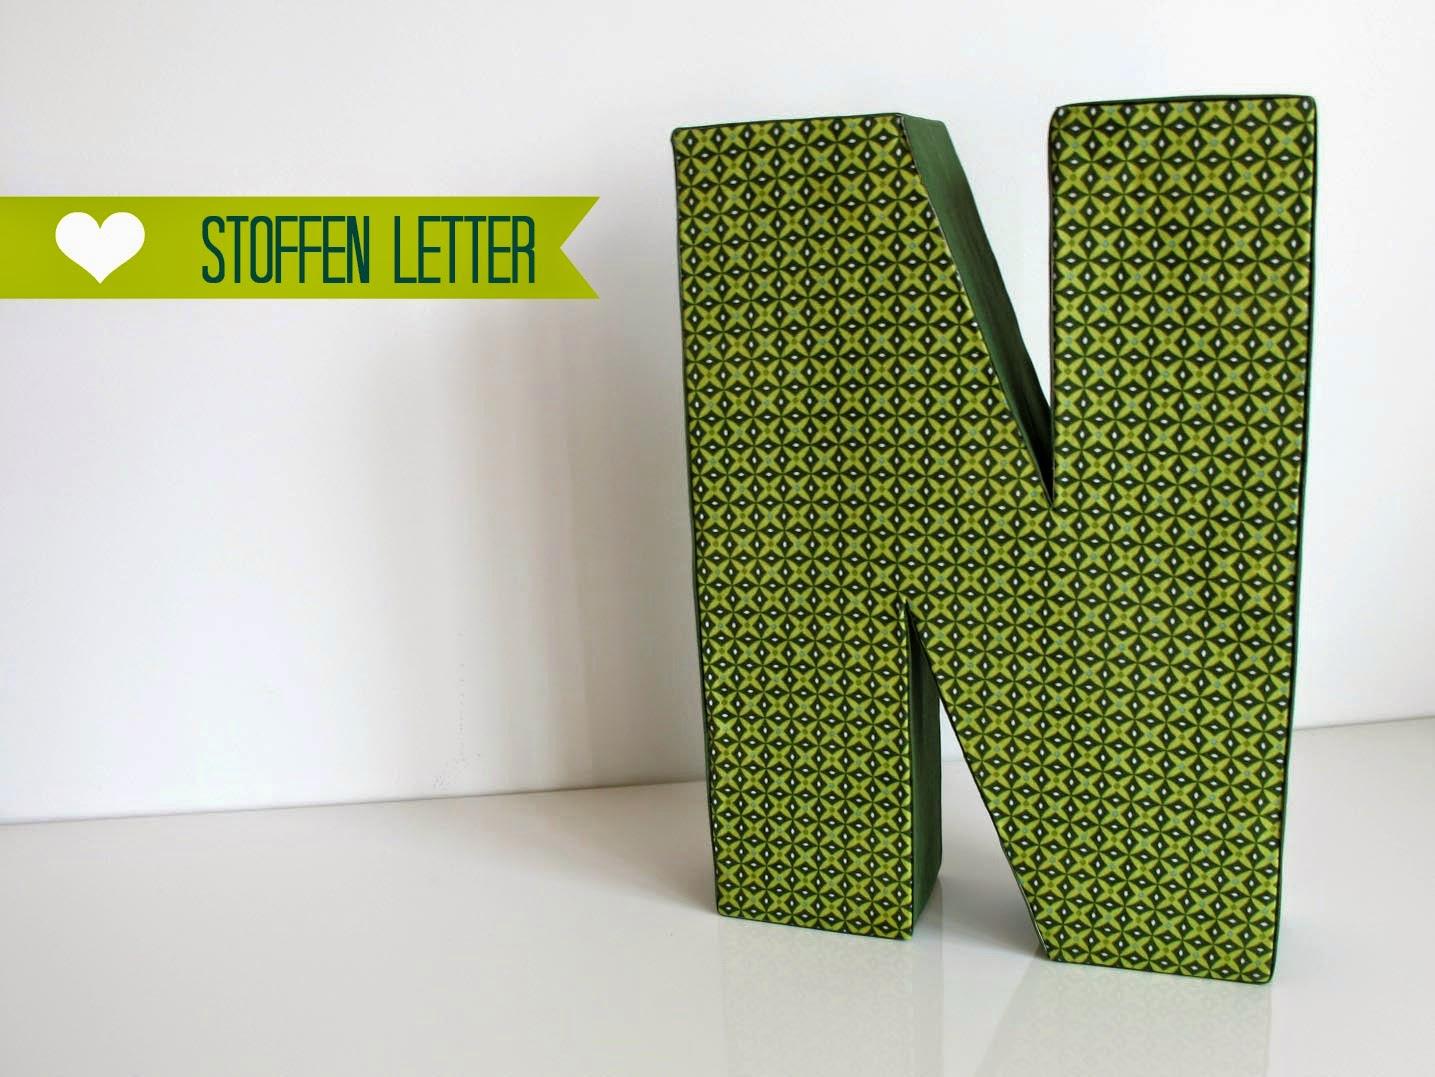 Pieke Wieke, Stoffen letters workshop